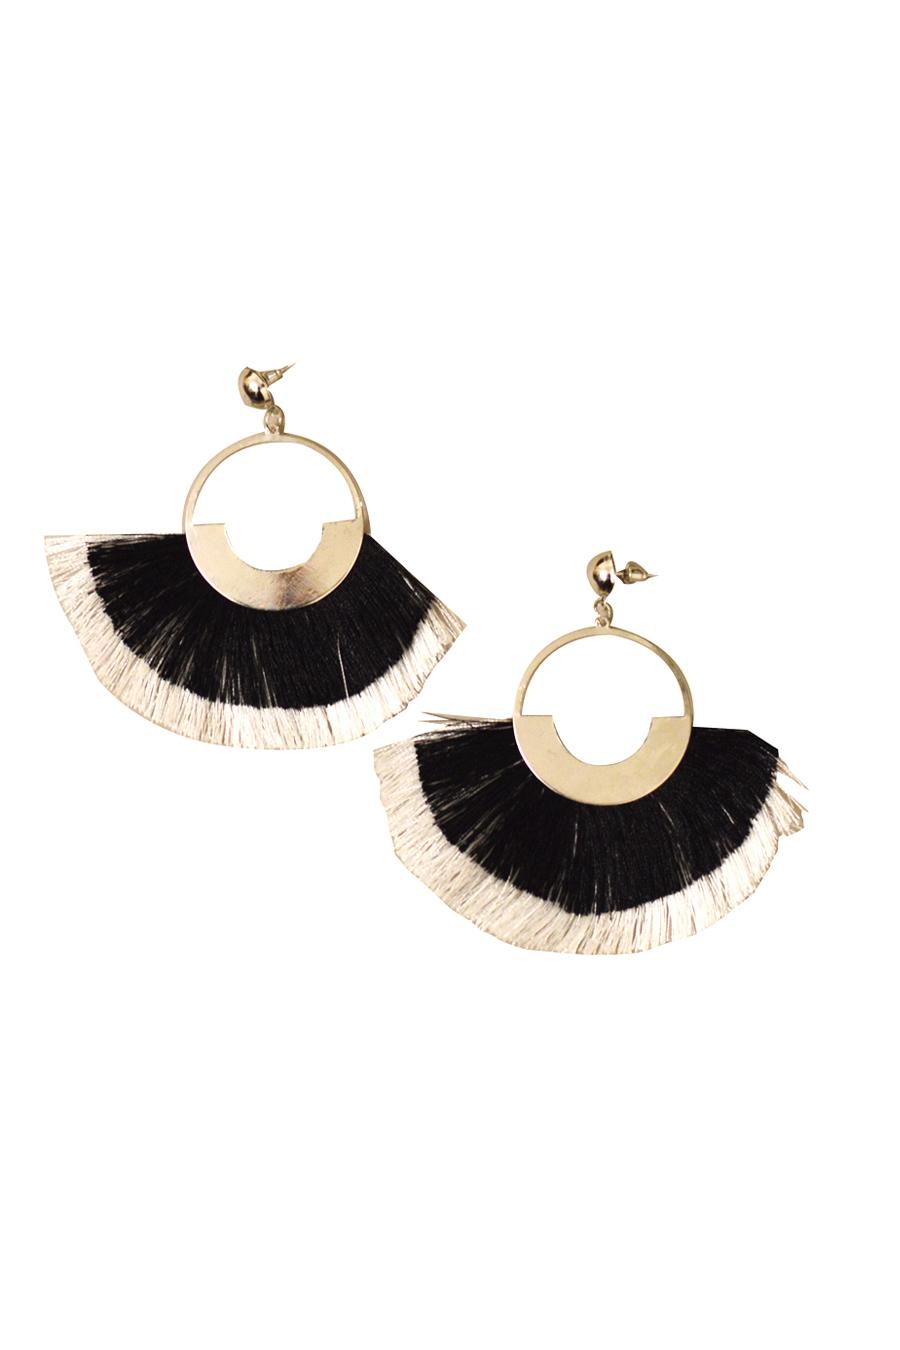 Contemporary Drop Earrings